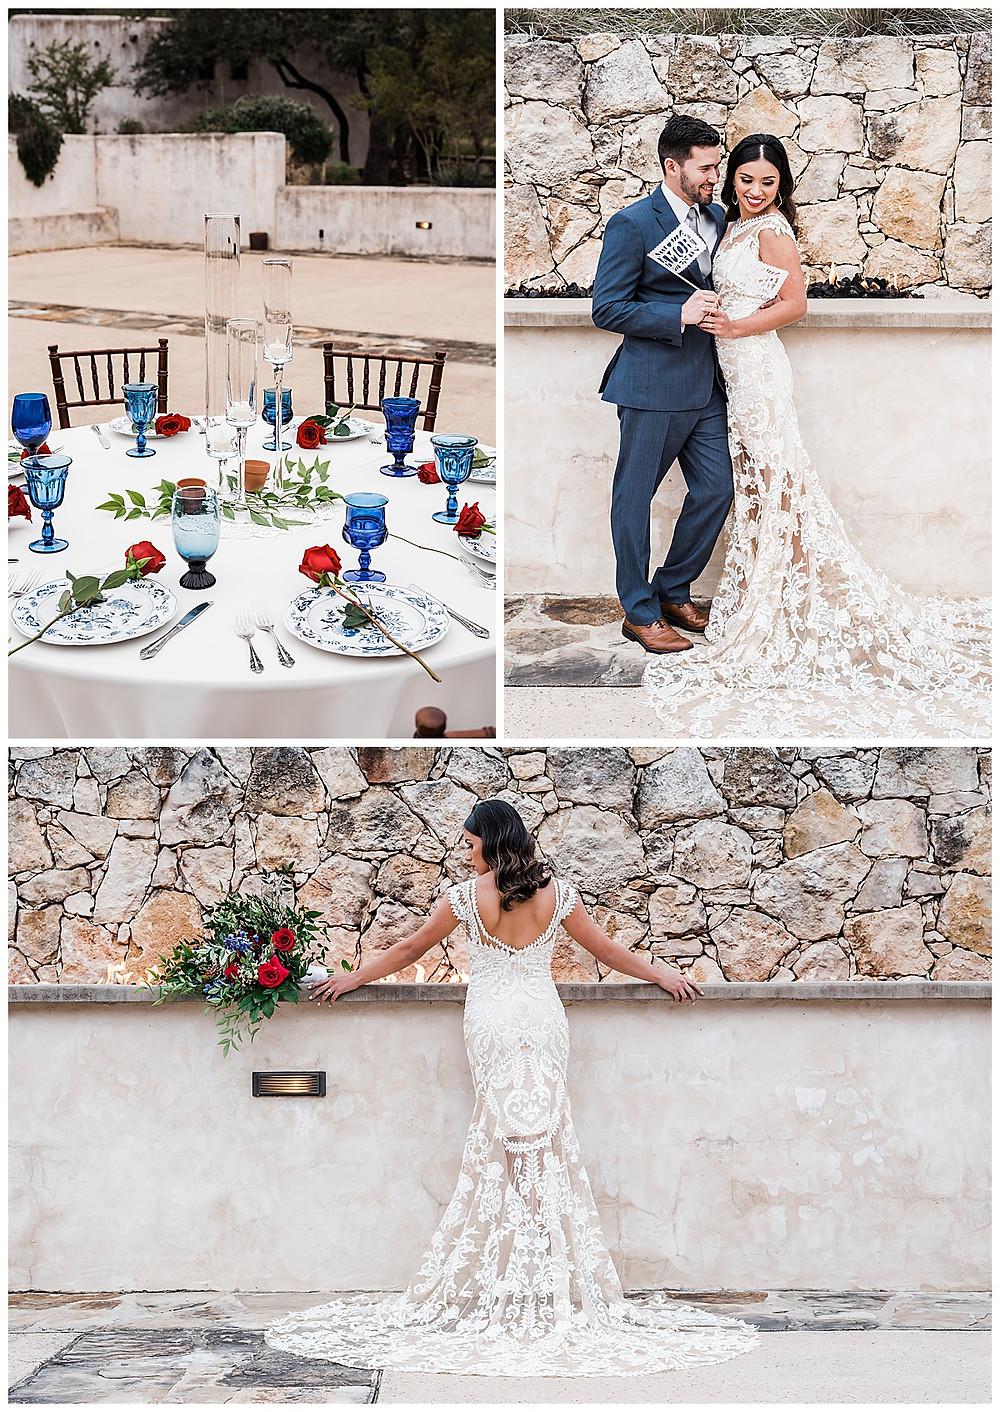 Spanish style wedding. Hill Country wedding. San Antonio Wedding Planner. Blue and white wedding. Bride and groom. Reception design.